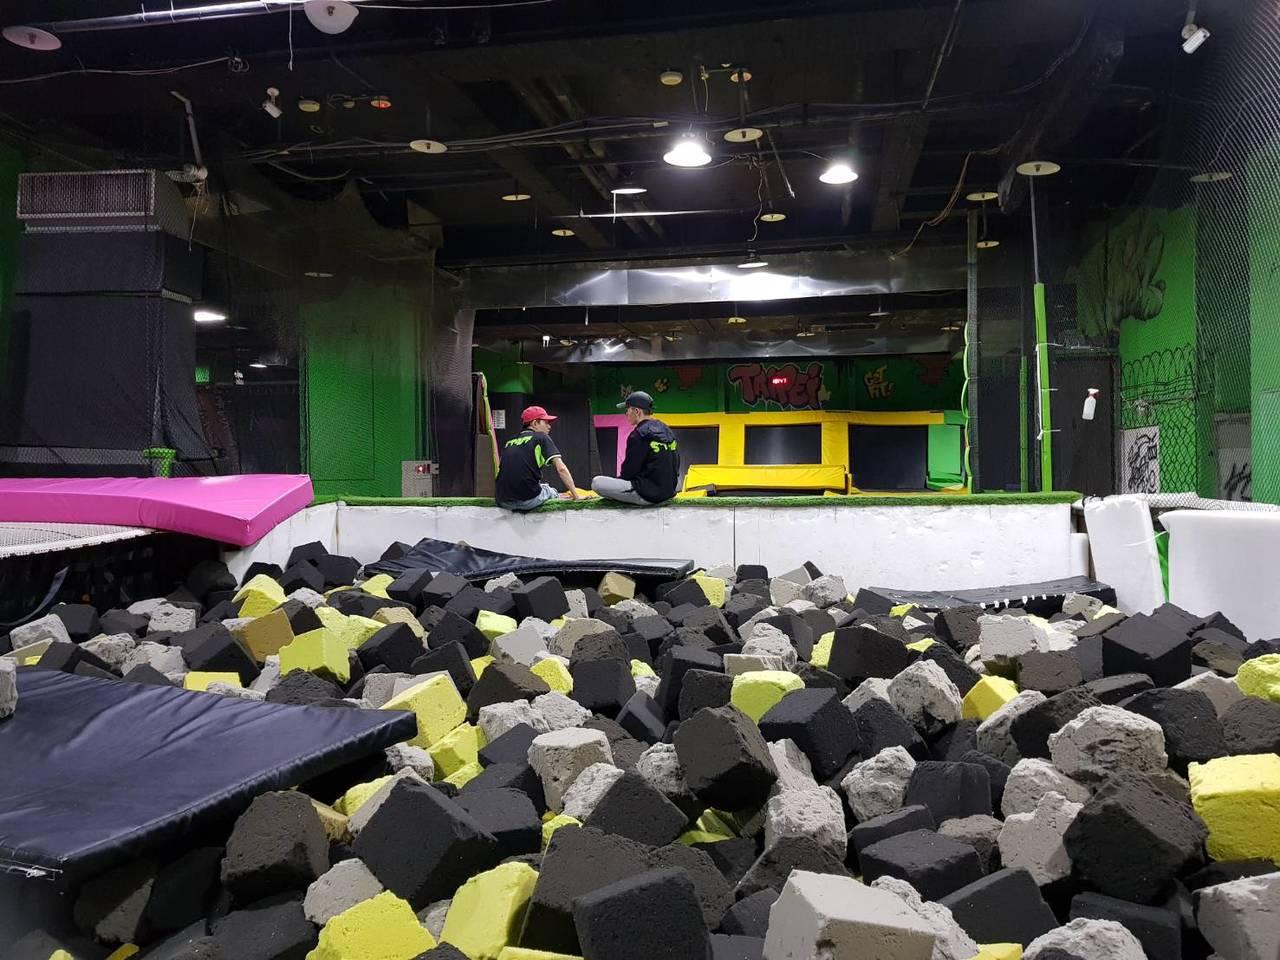 Flipout Taipei跳跳床樂園是類似彈簧床的極限運動樂園。圖/讀者提供